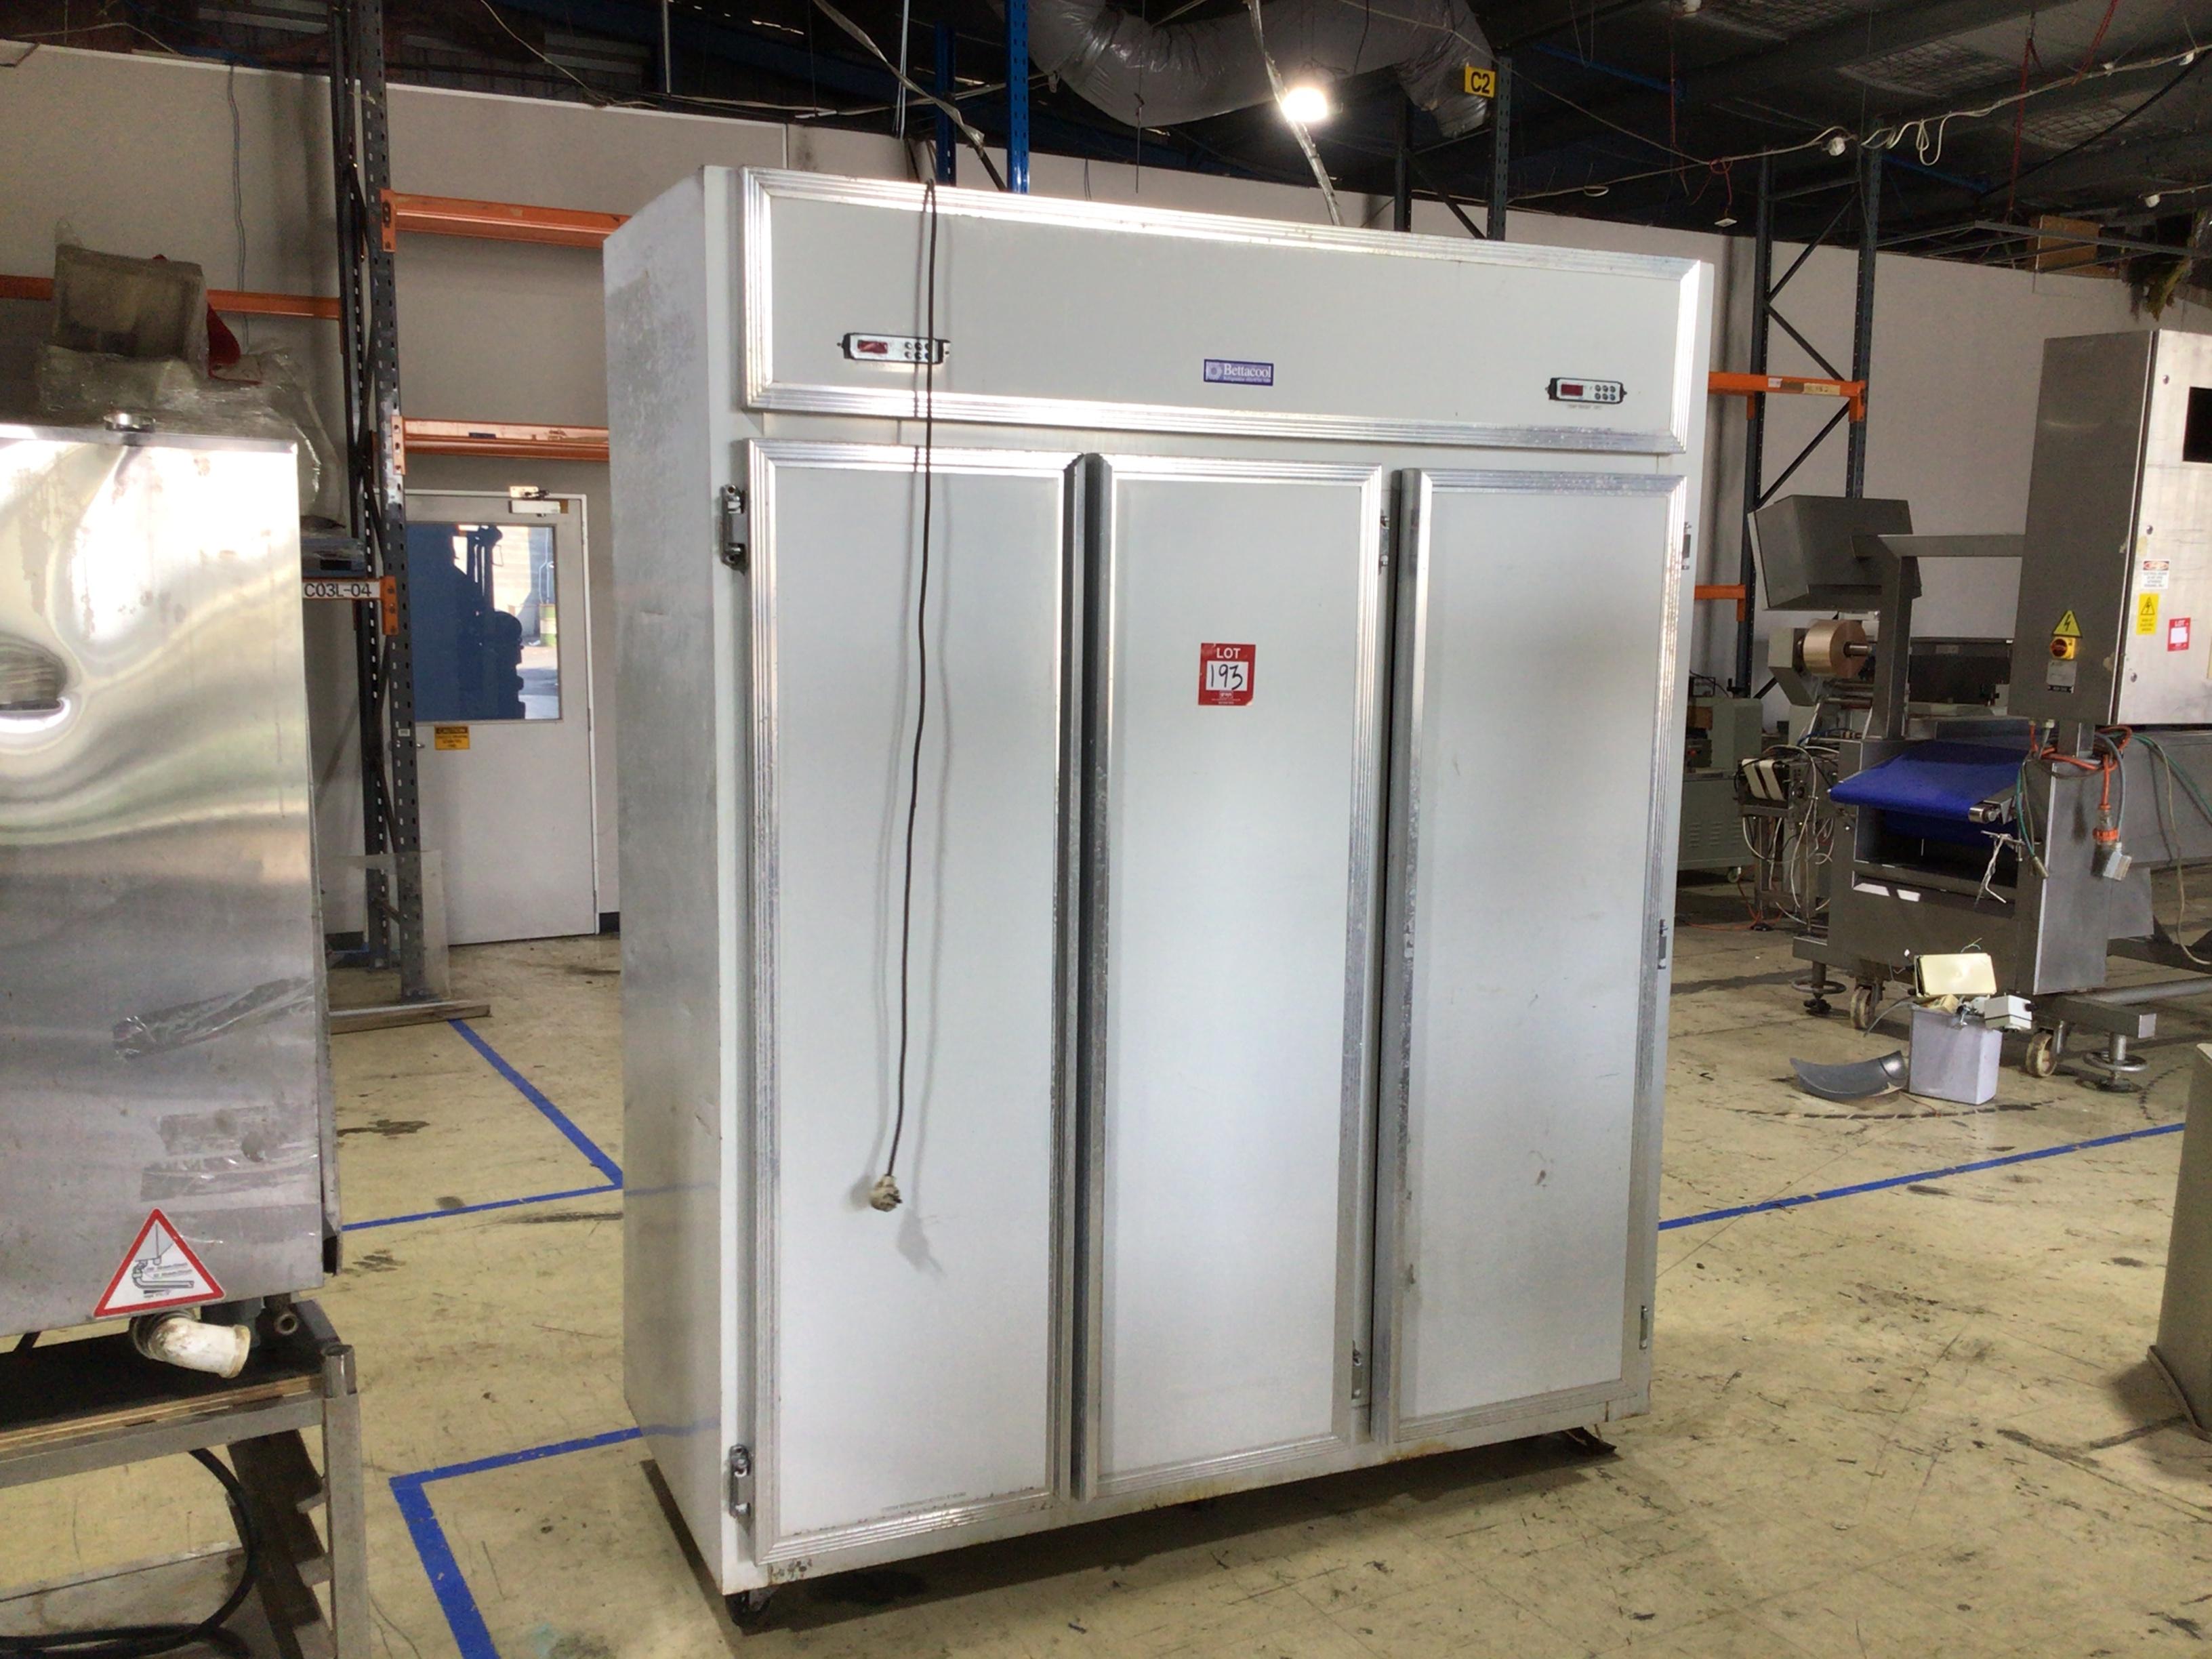 Bettacool Fridge and Freezer Unit